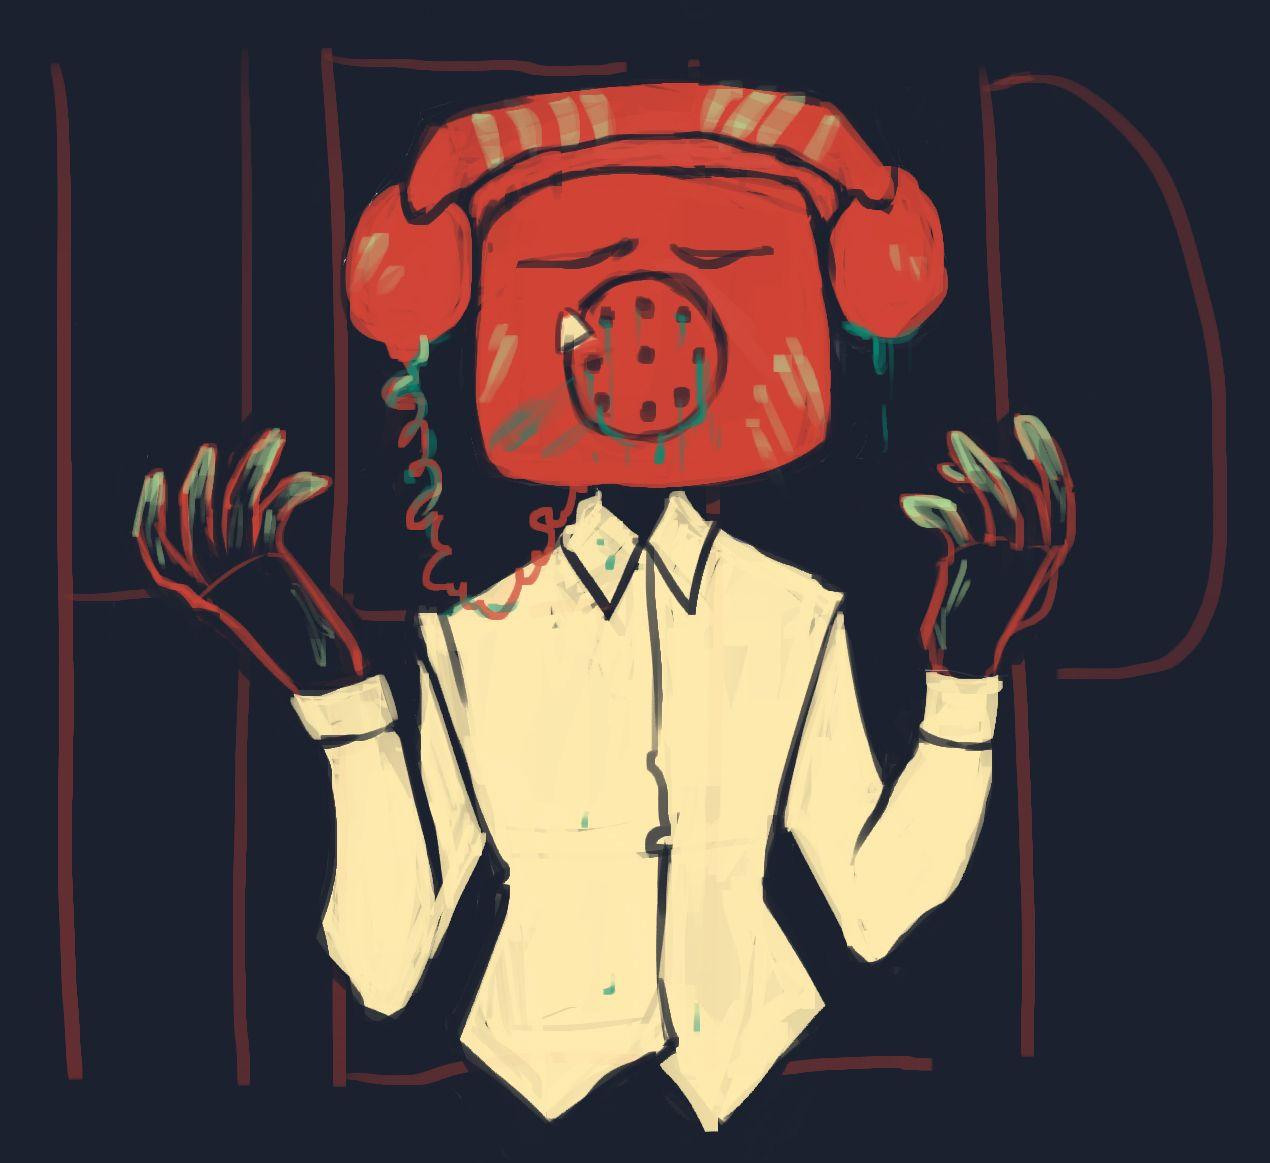 Phone guy